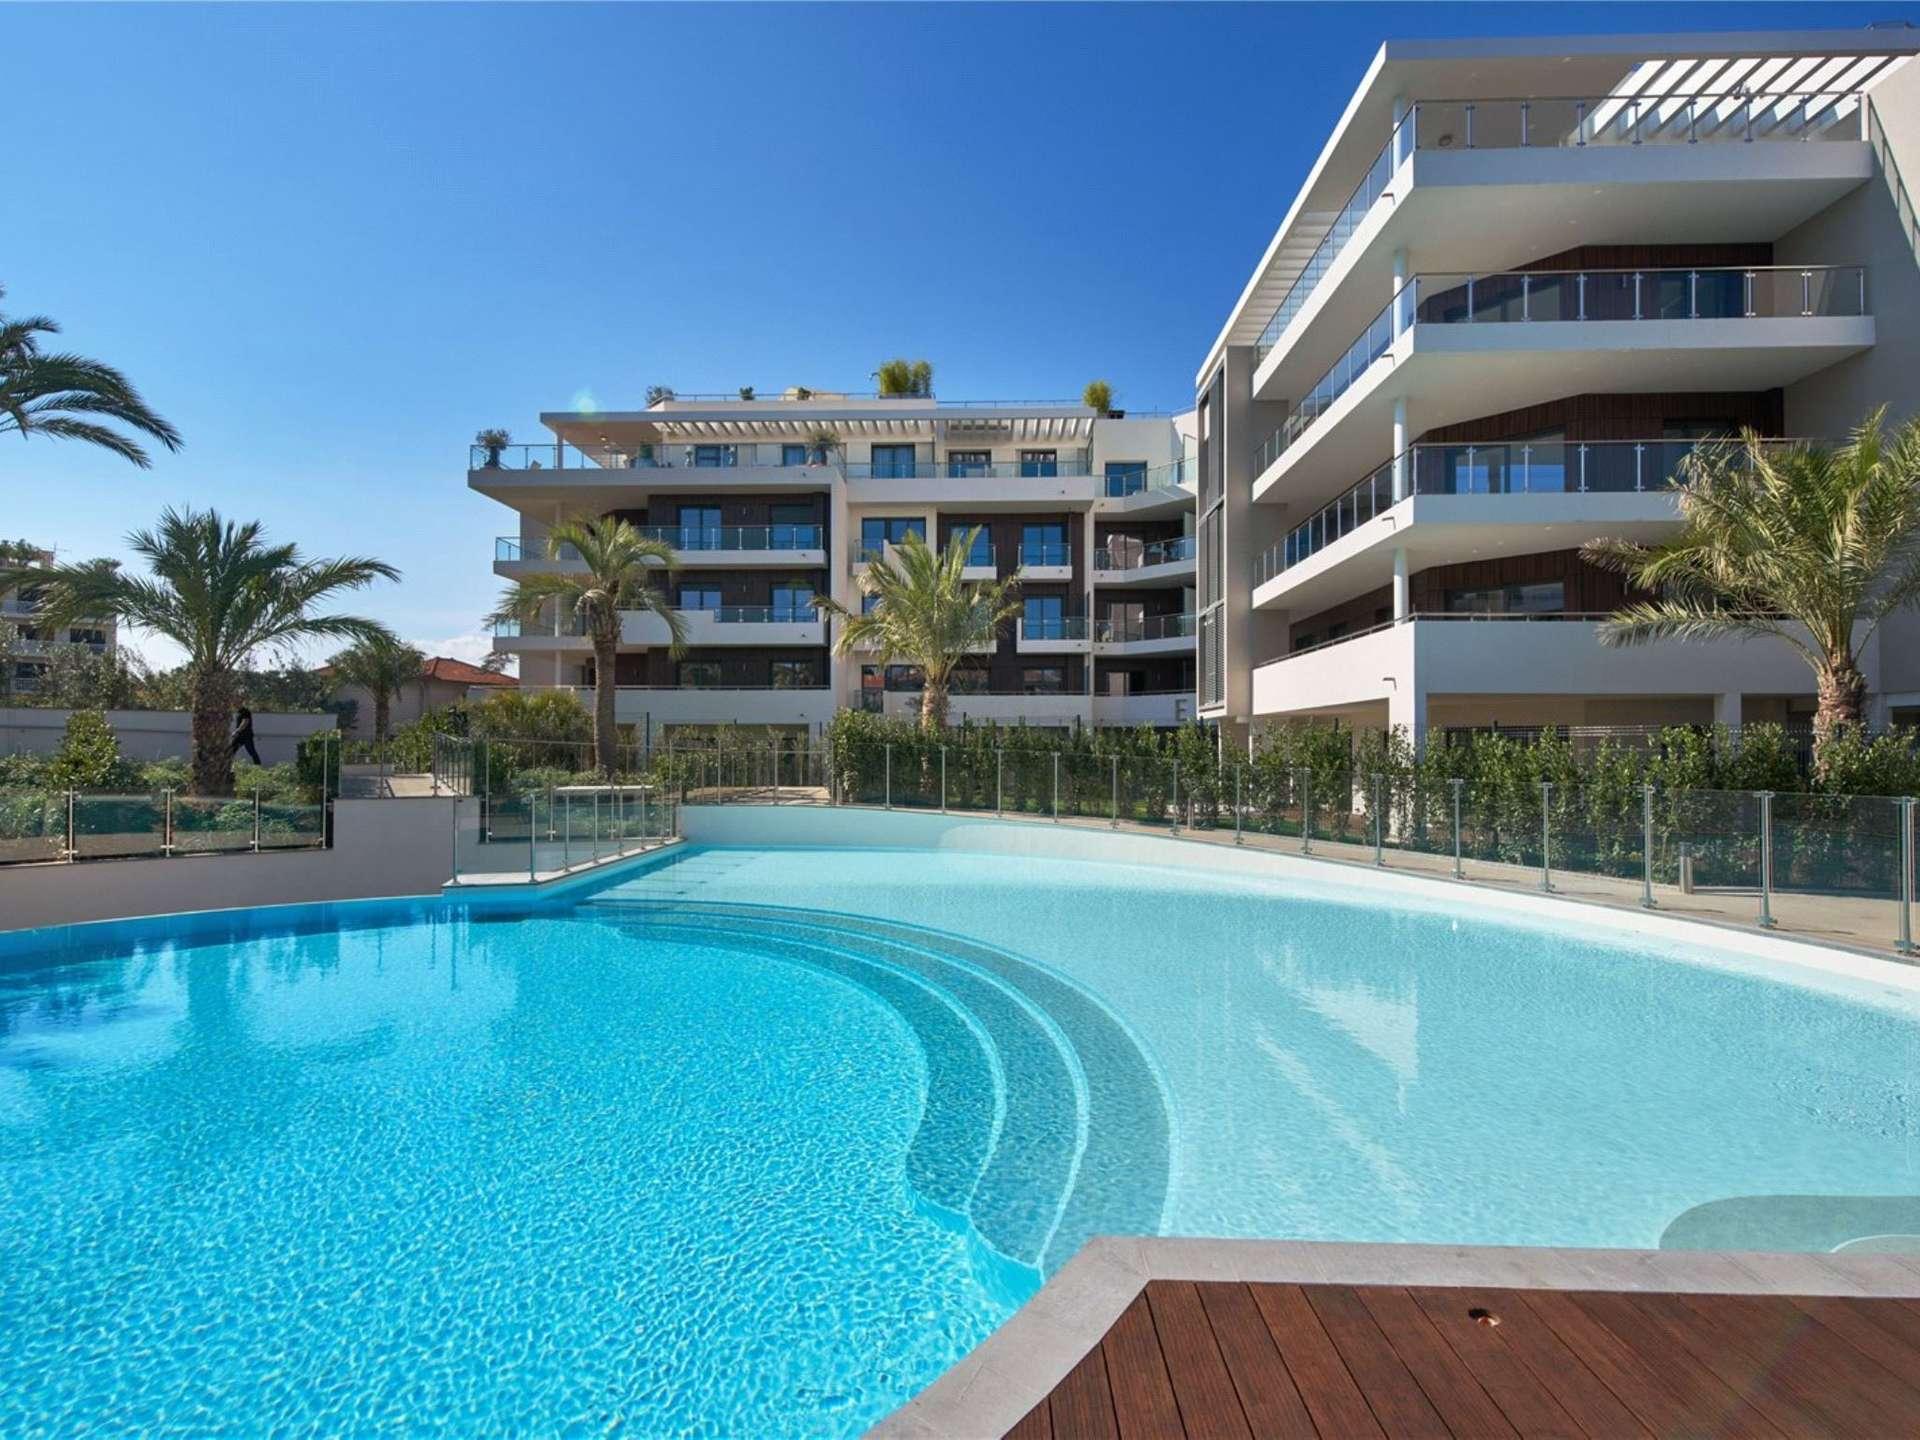 Savills | Parc du Cap, Cap D\'Antibes, French Riviera, 06160 ...